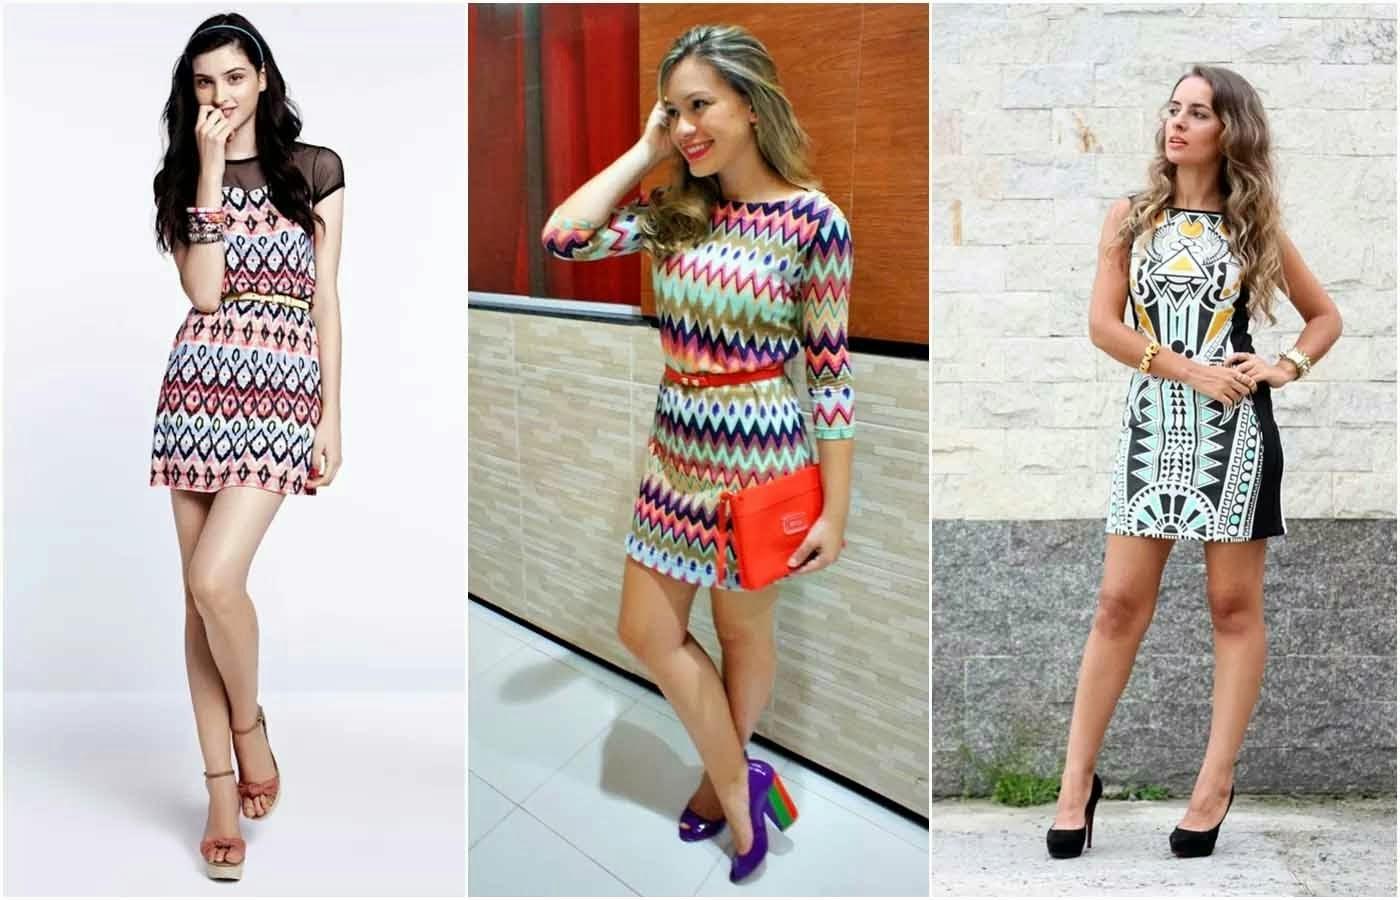 http://outfitdeldia.blogspot.com/2014/03/vestidos-coloridos-estampados-y.html